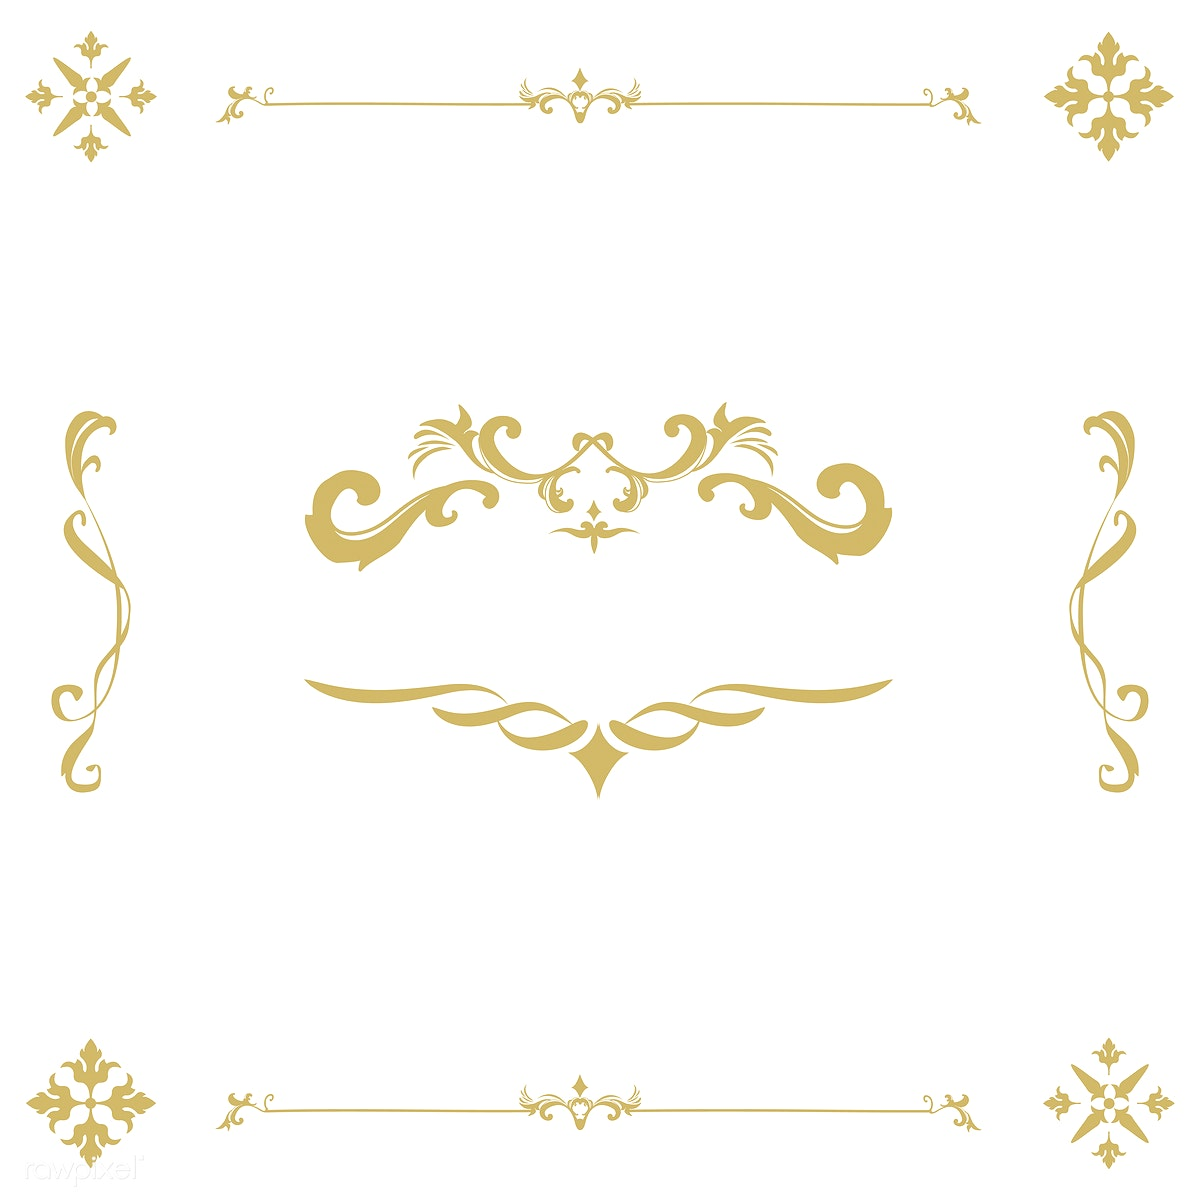 0c30ba8fa91 Vintage flourish ornament frame vector